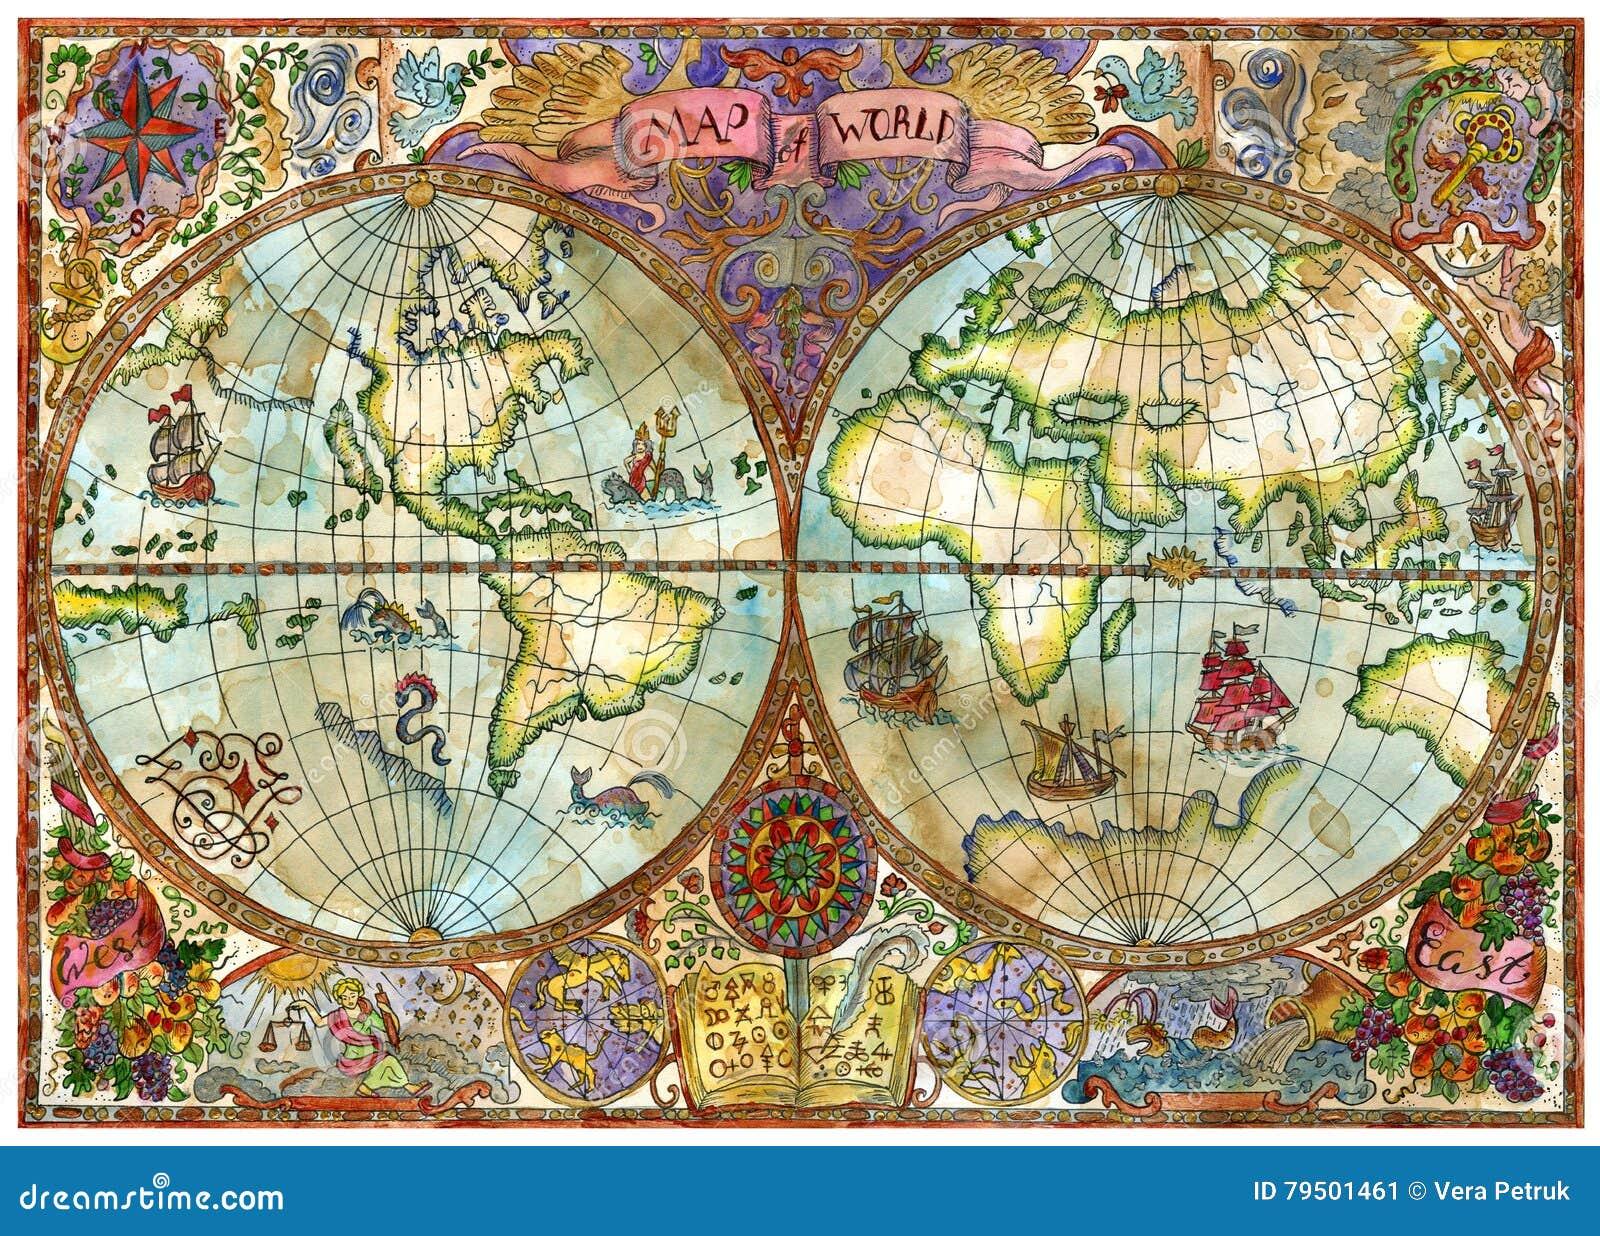 Vintage illustration with world atlas map on old paper stock vintage illustration with world atlas map on old paper royalty free illustration download gumiabroncs Images